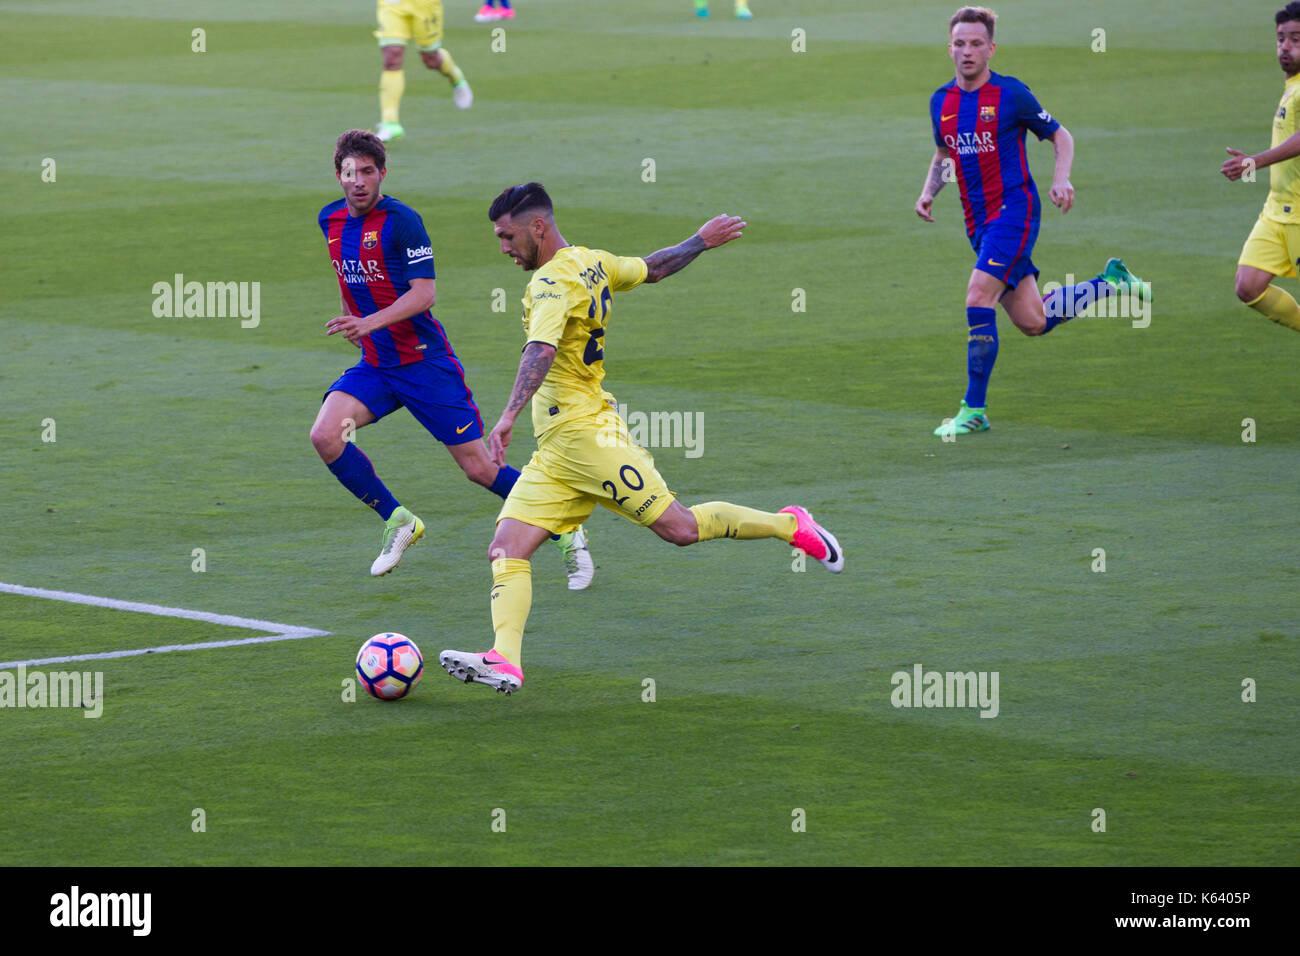 Sergi Roberto of FC Barcelona - 6/5/17 Barcelona v Villarreal football league match at the Camp Nou stadium, Barcelona. - Stock Image